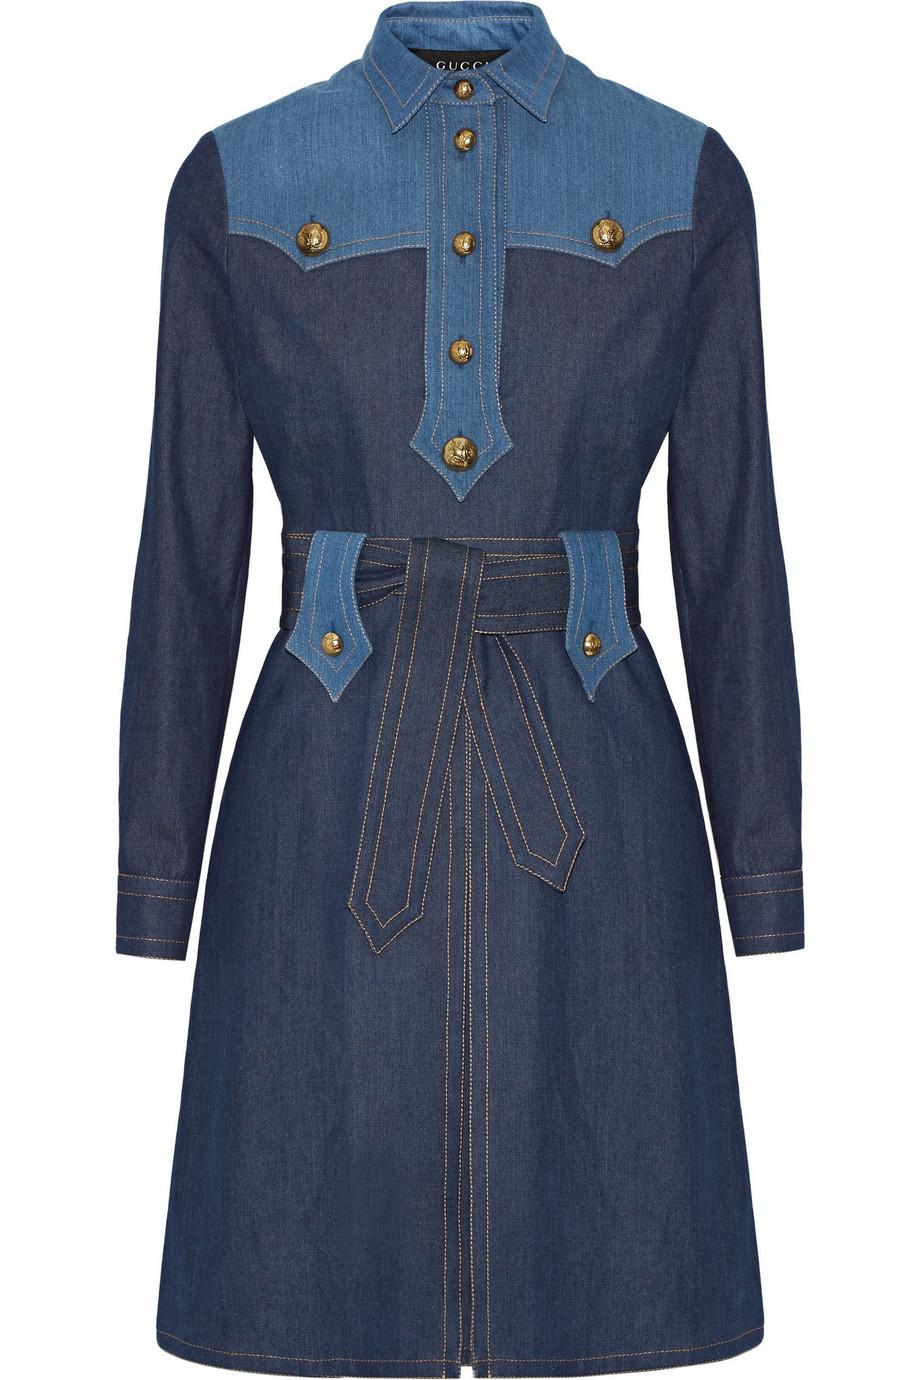 Gucci Two-Tone Denim Dress, Size: 46